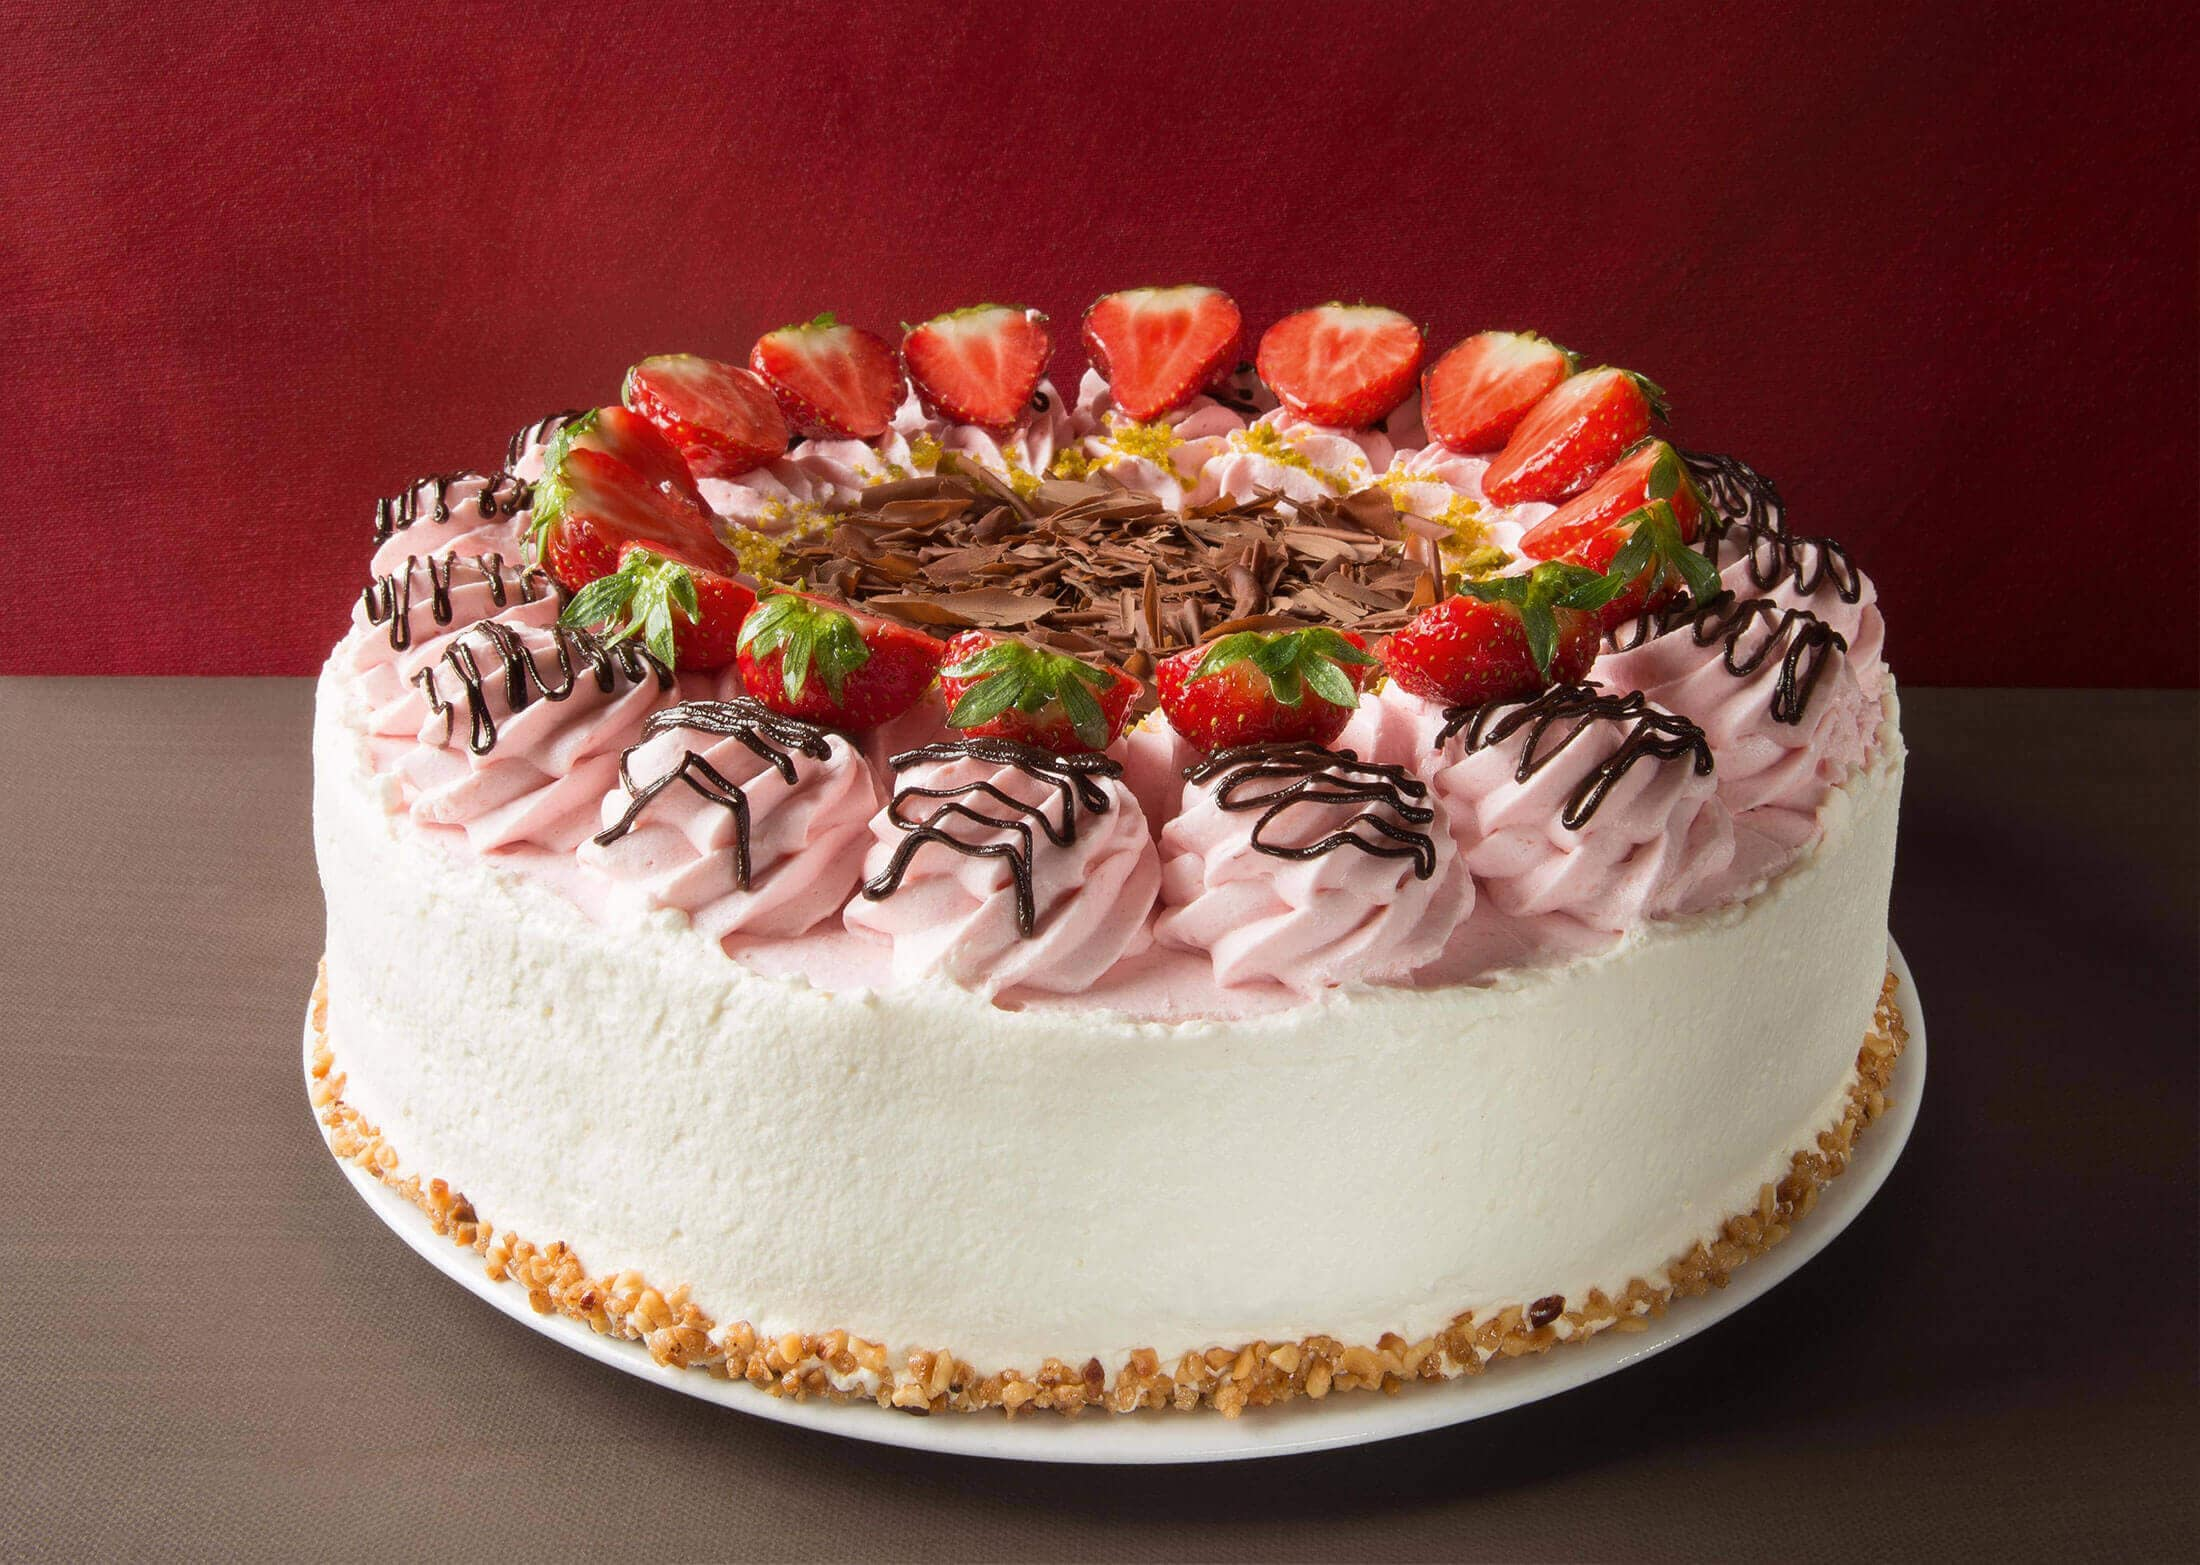 Monatstorte Mai & Juli – Erdbeer-Sahne-Torte